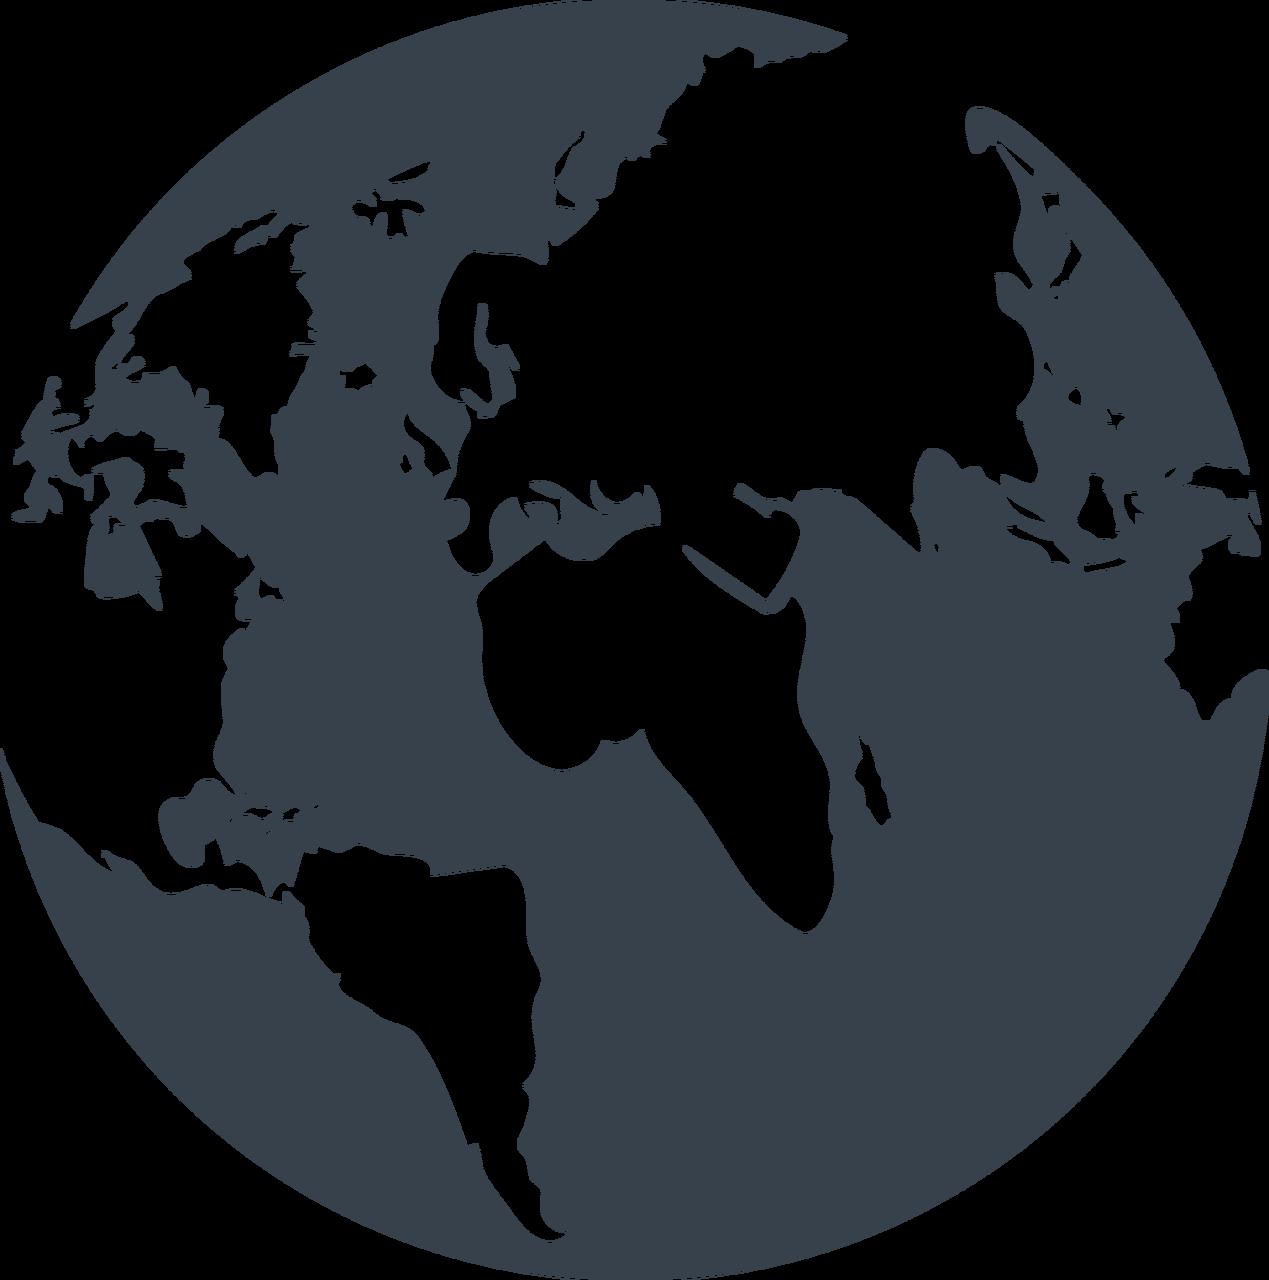 Earth SVG Cut File